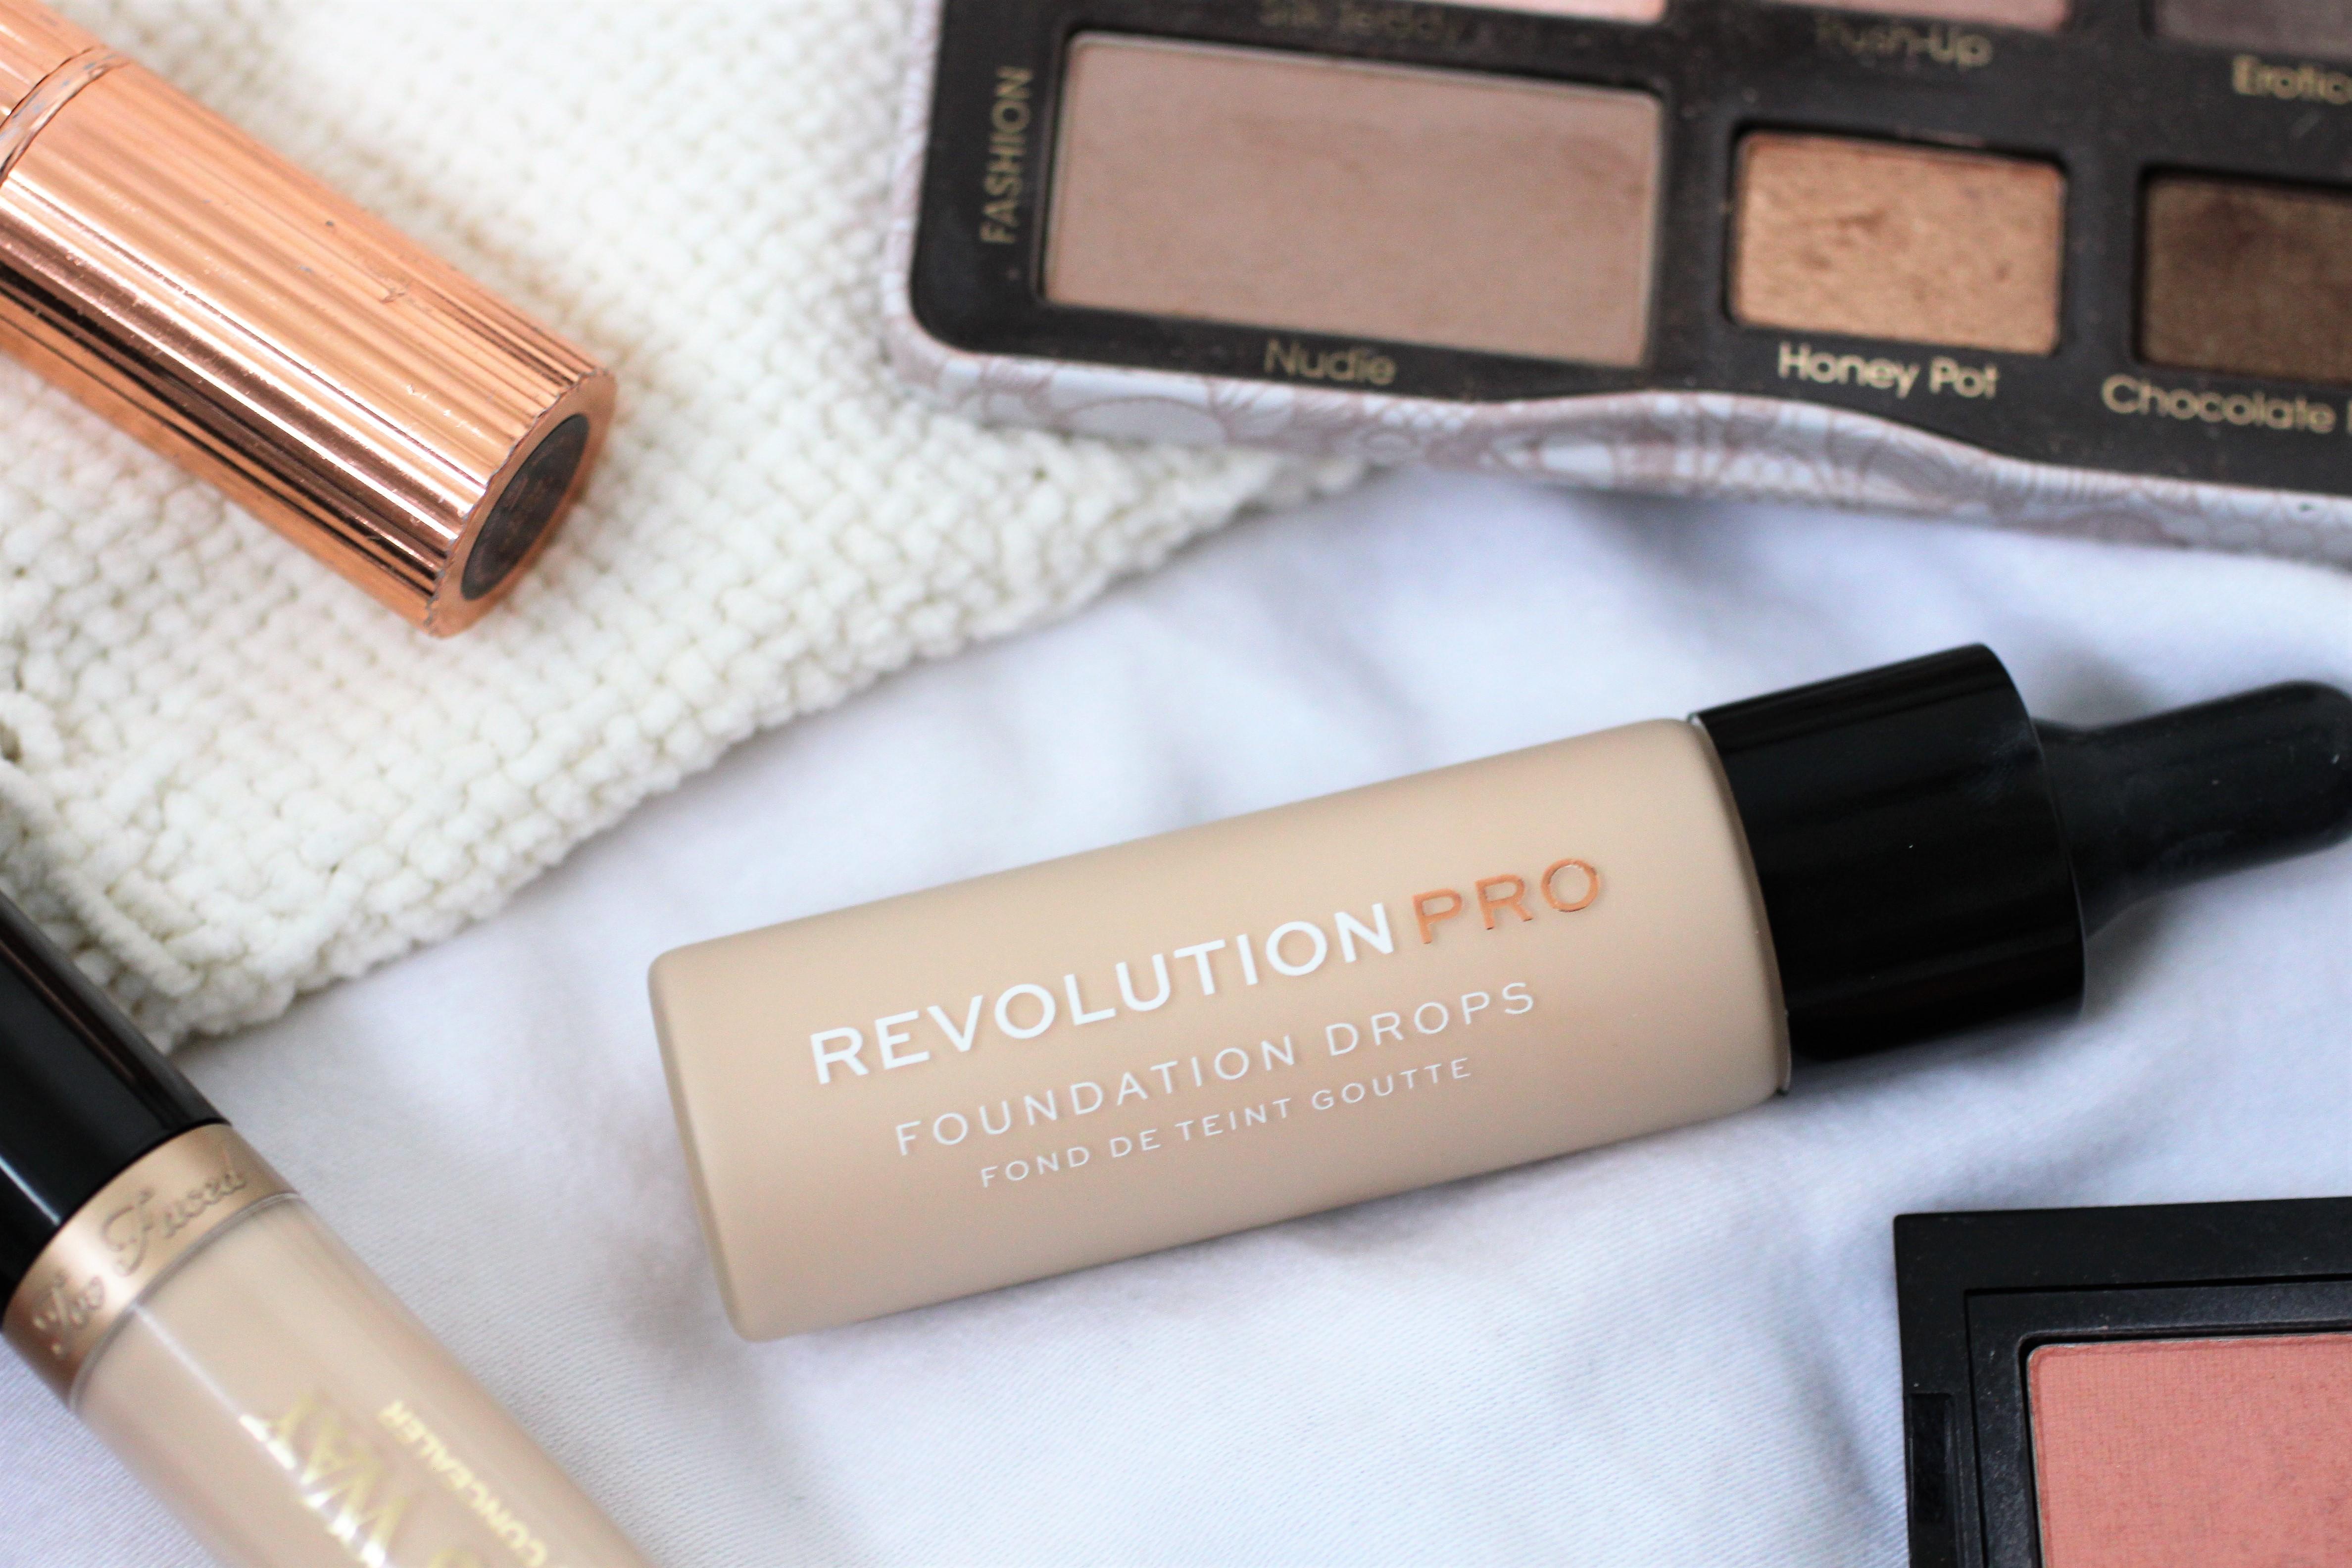 revolution pro foundation drops